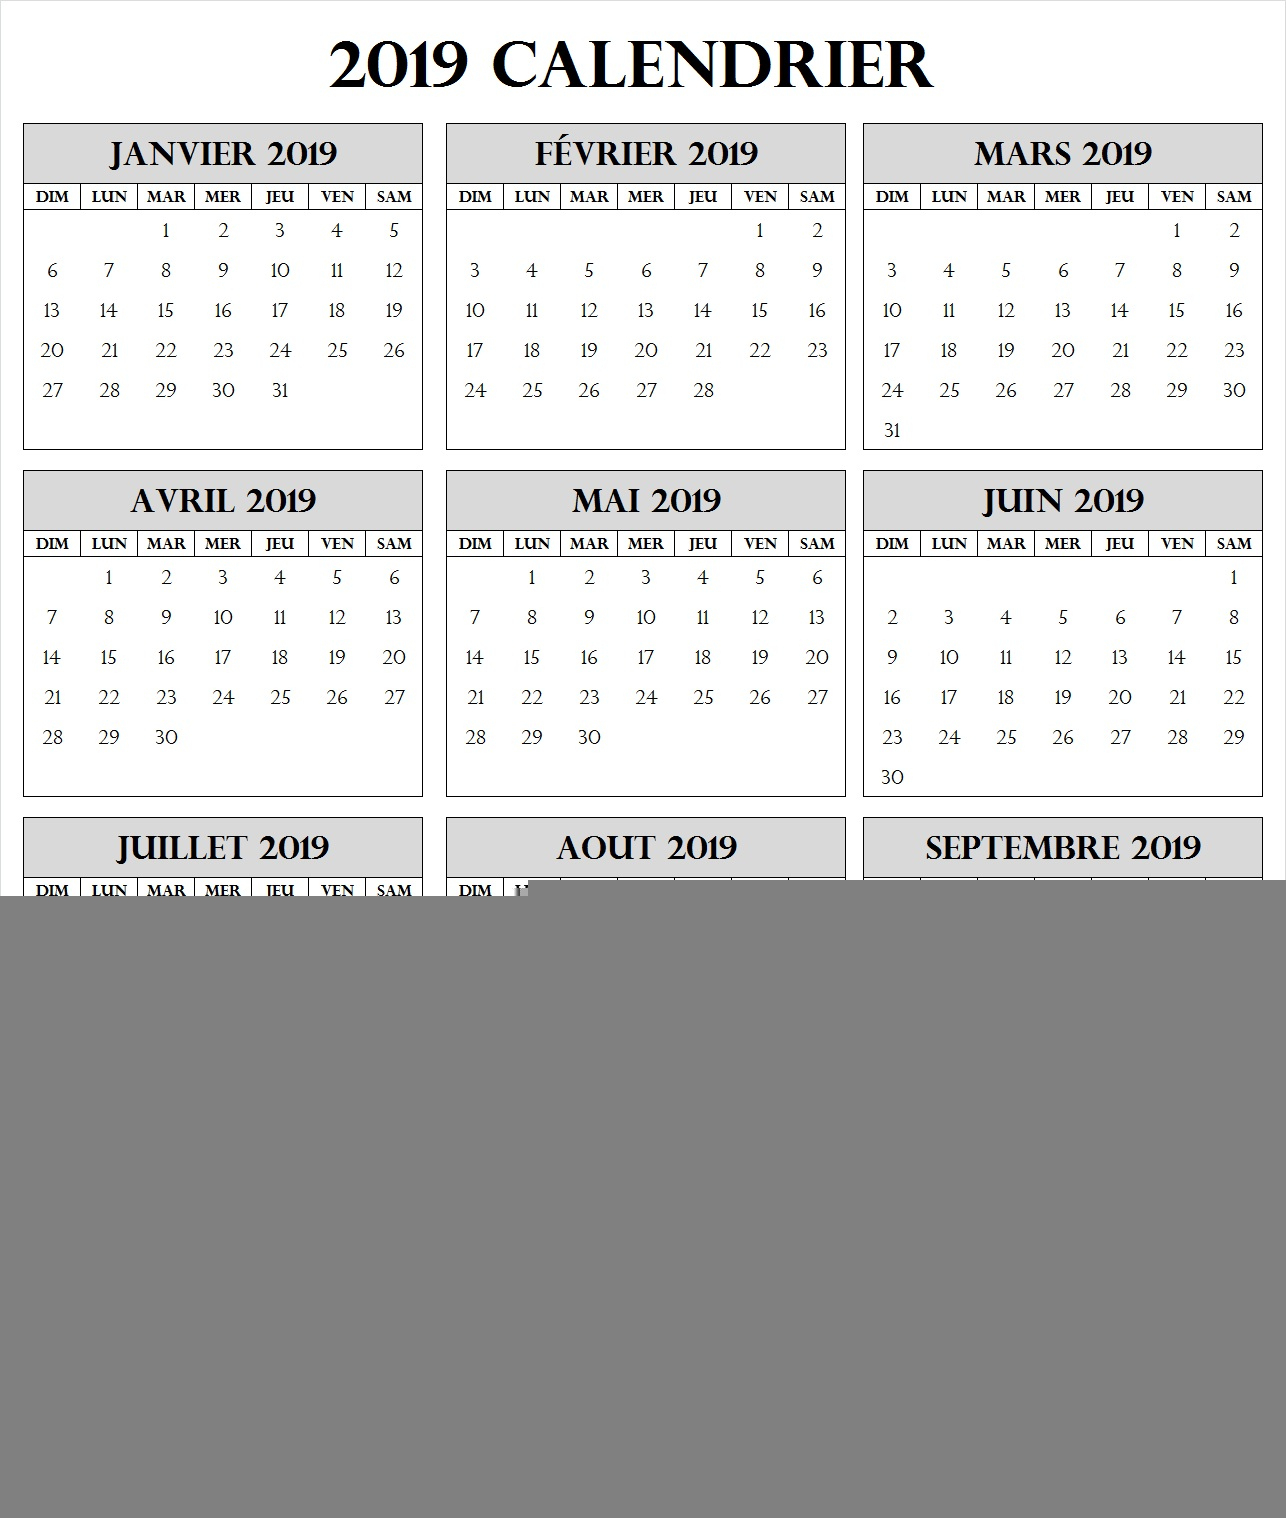 Calendrier 2019 | Calendrier Annually 2019 À Imprimer encequiconcerne Calendrier Annuel 2018 À Imprimer